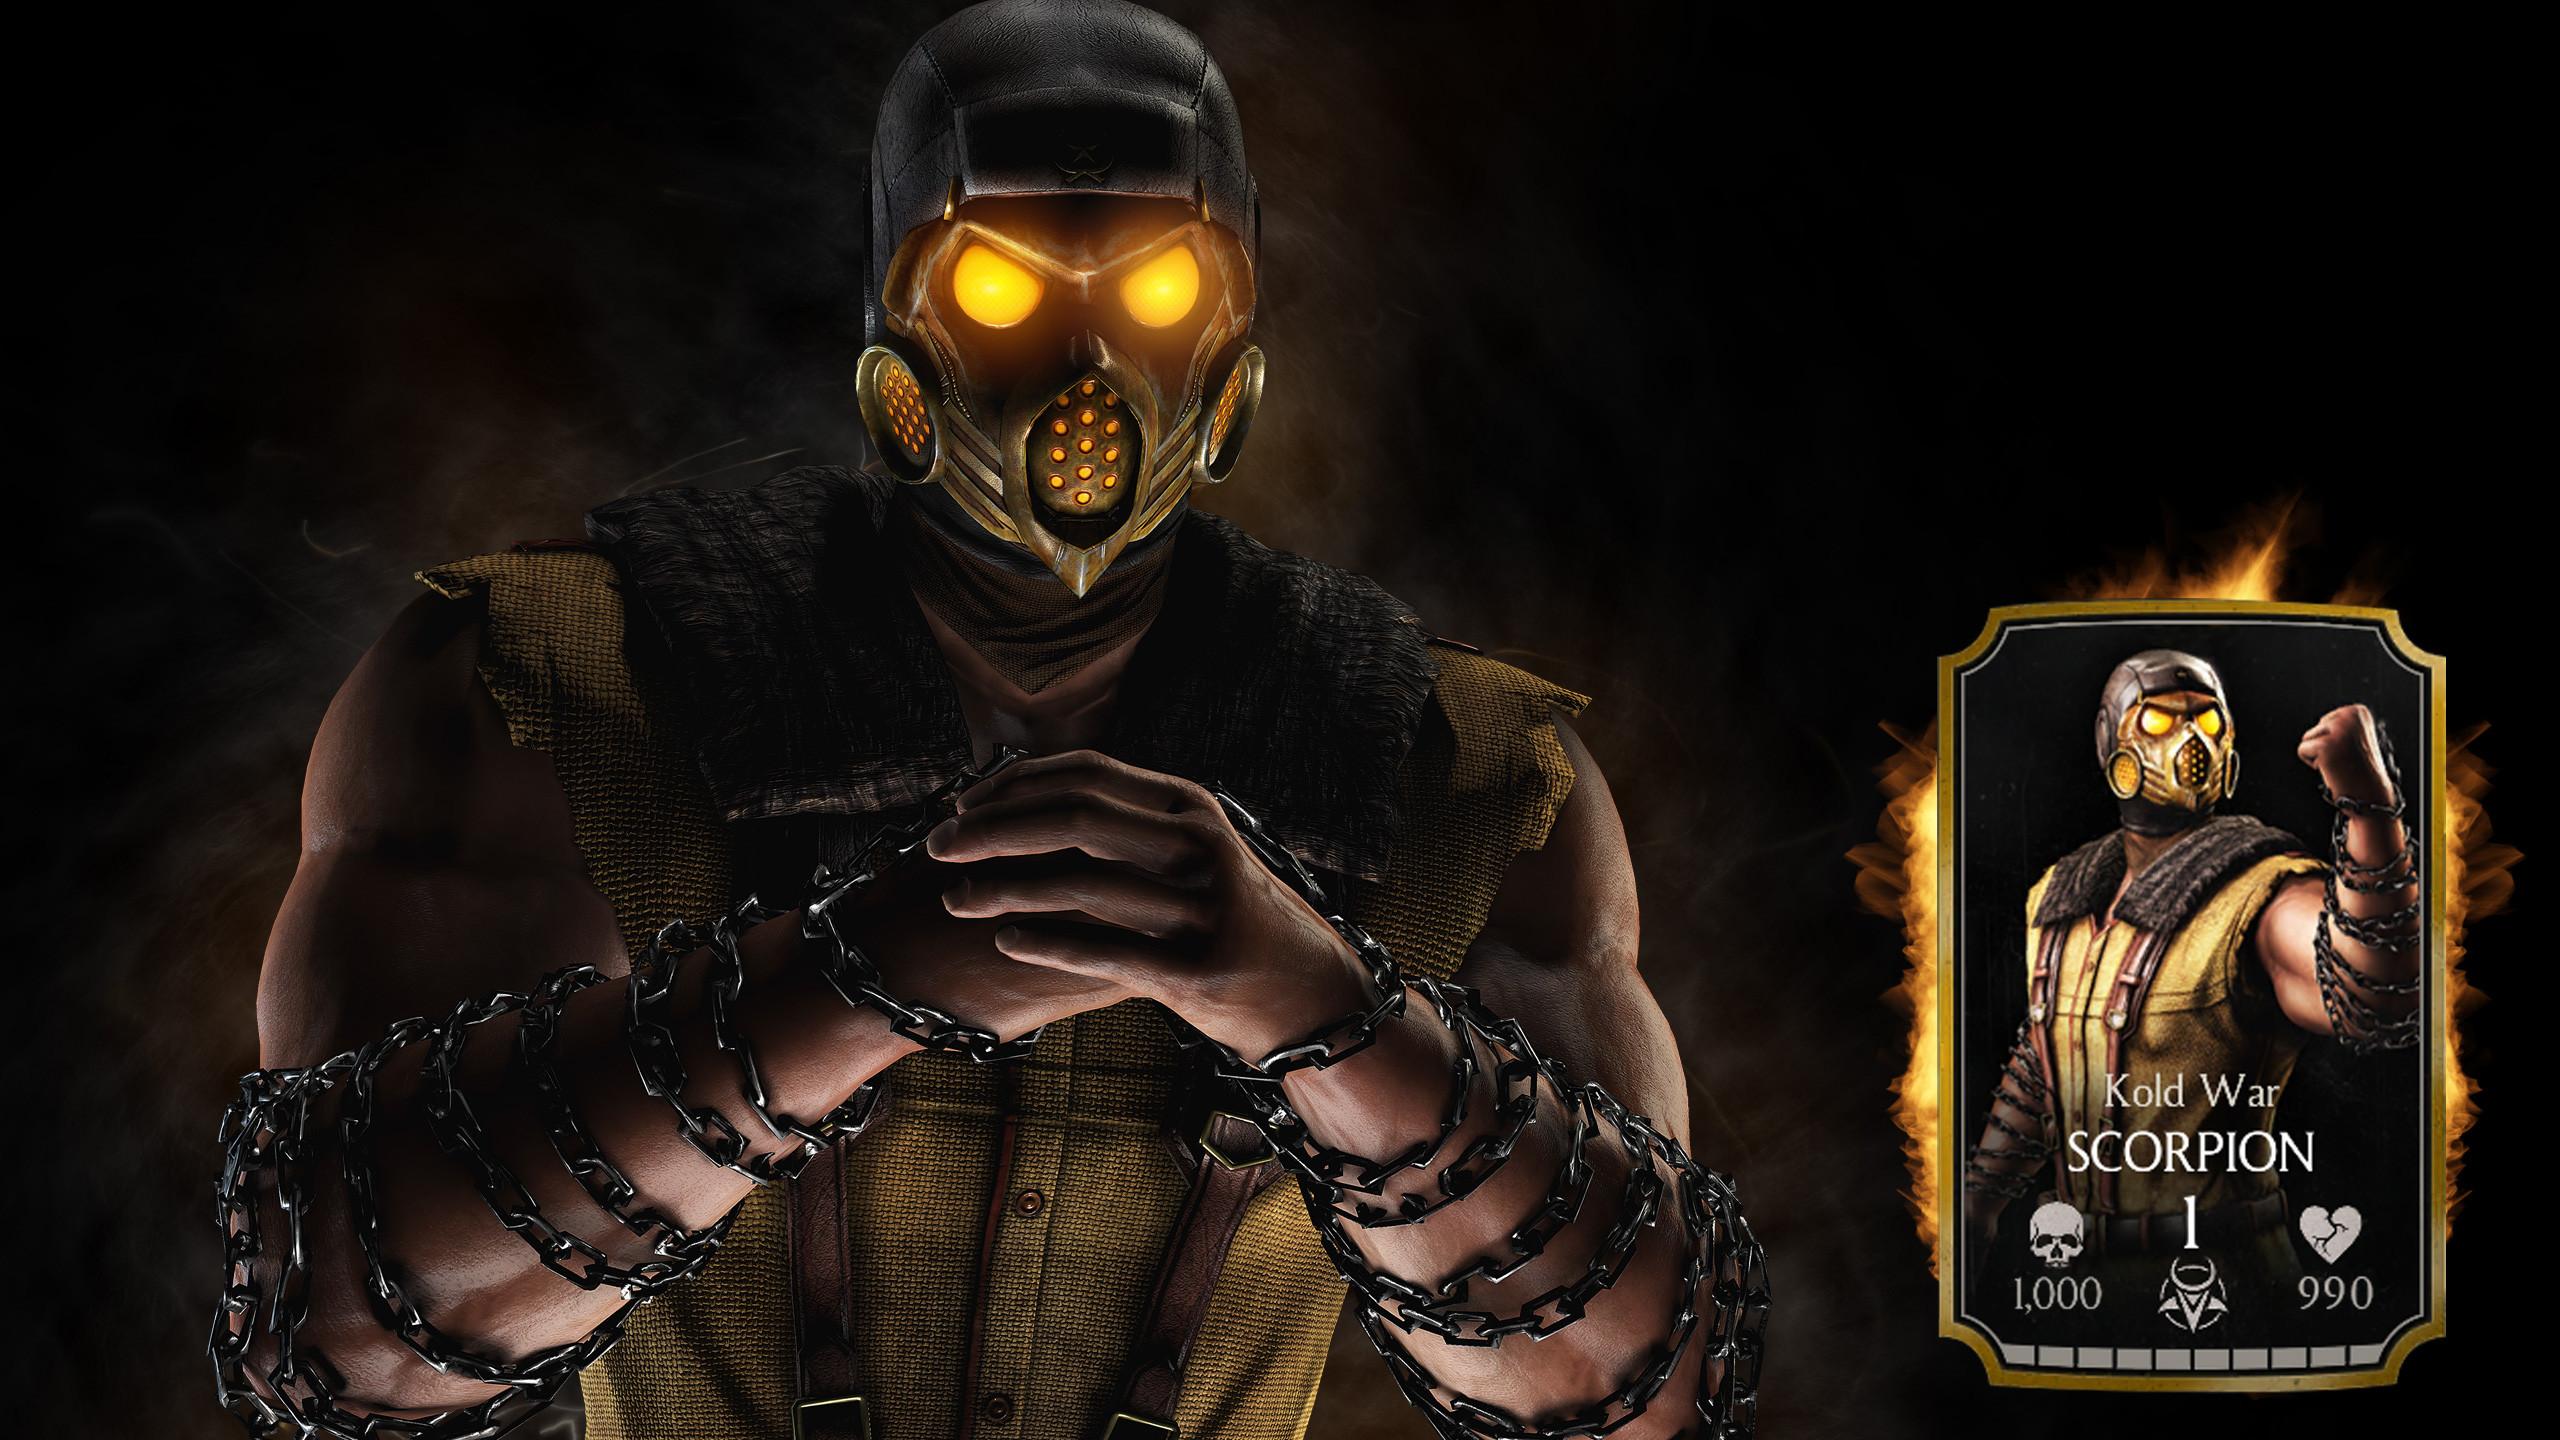 Scorpion Mortal Kombat X wallpapers (84 Wallpapers)